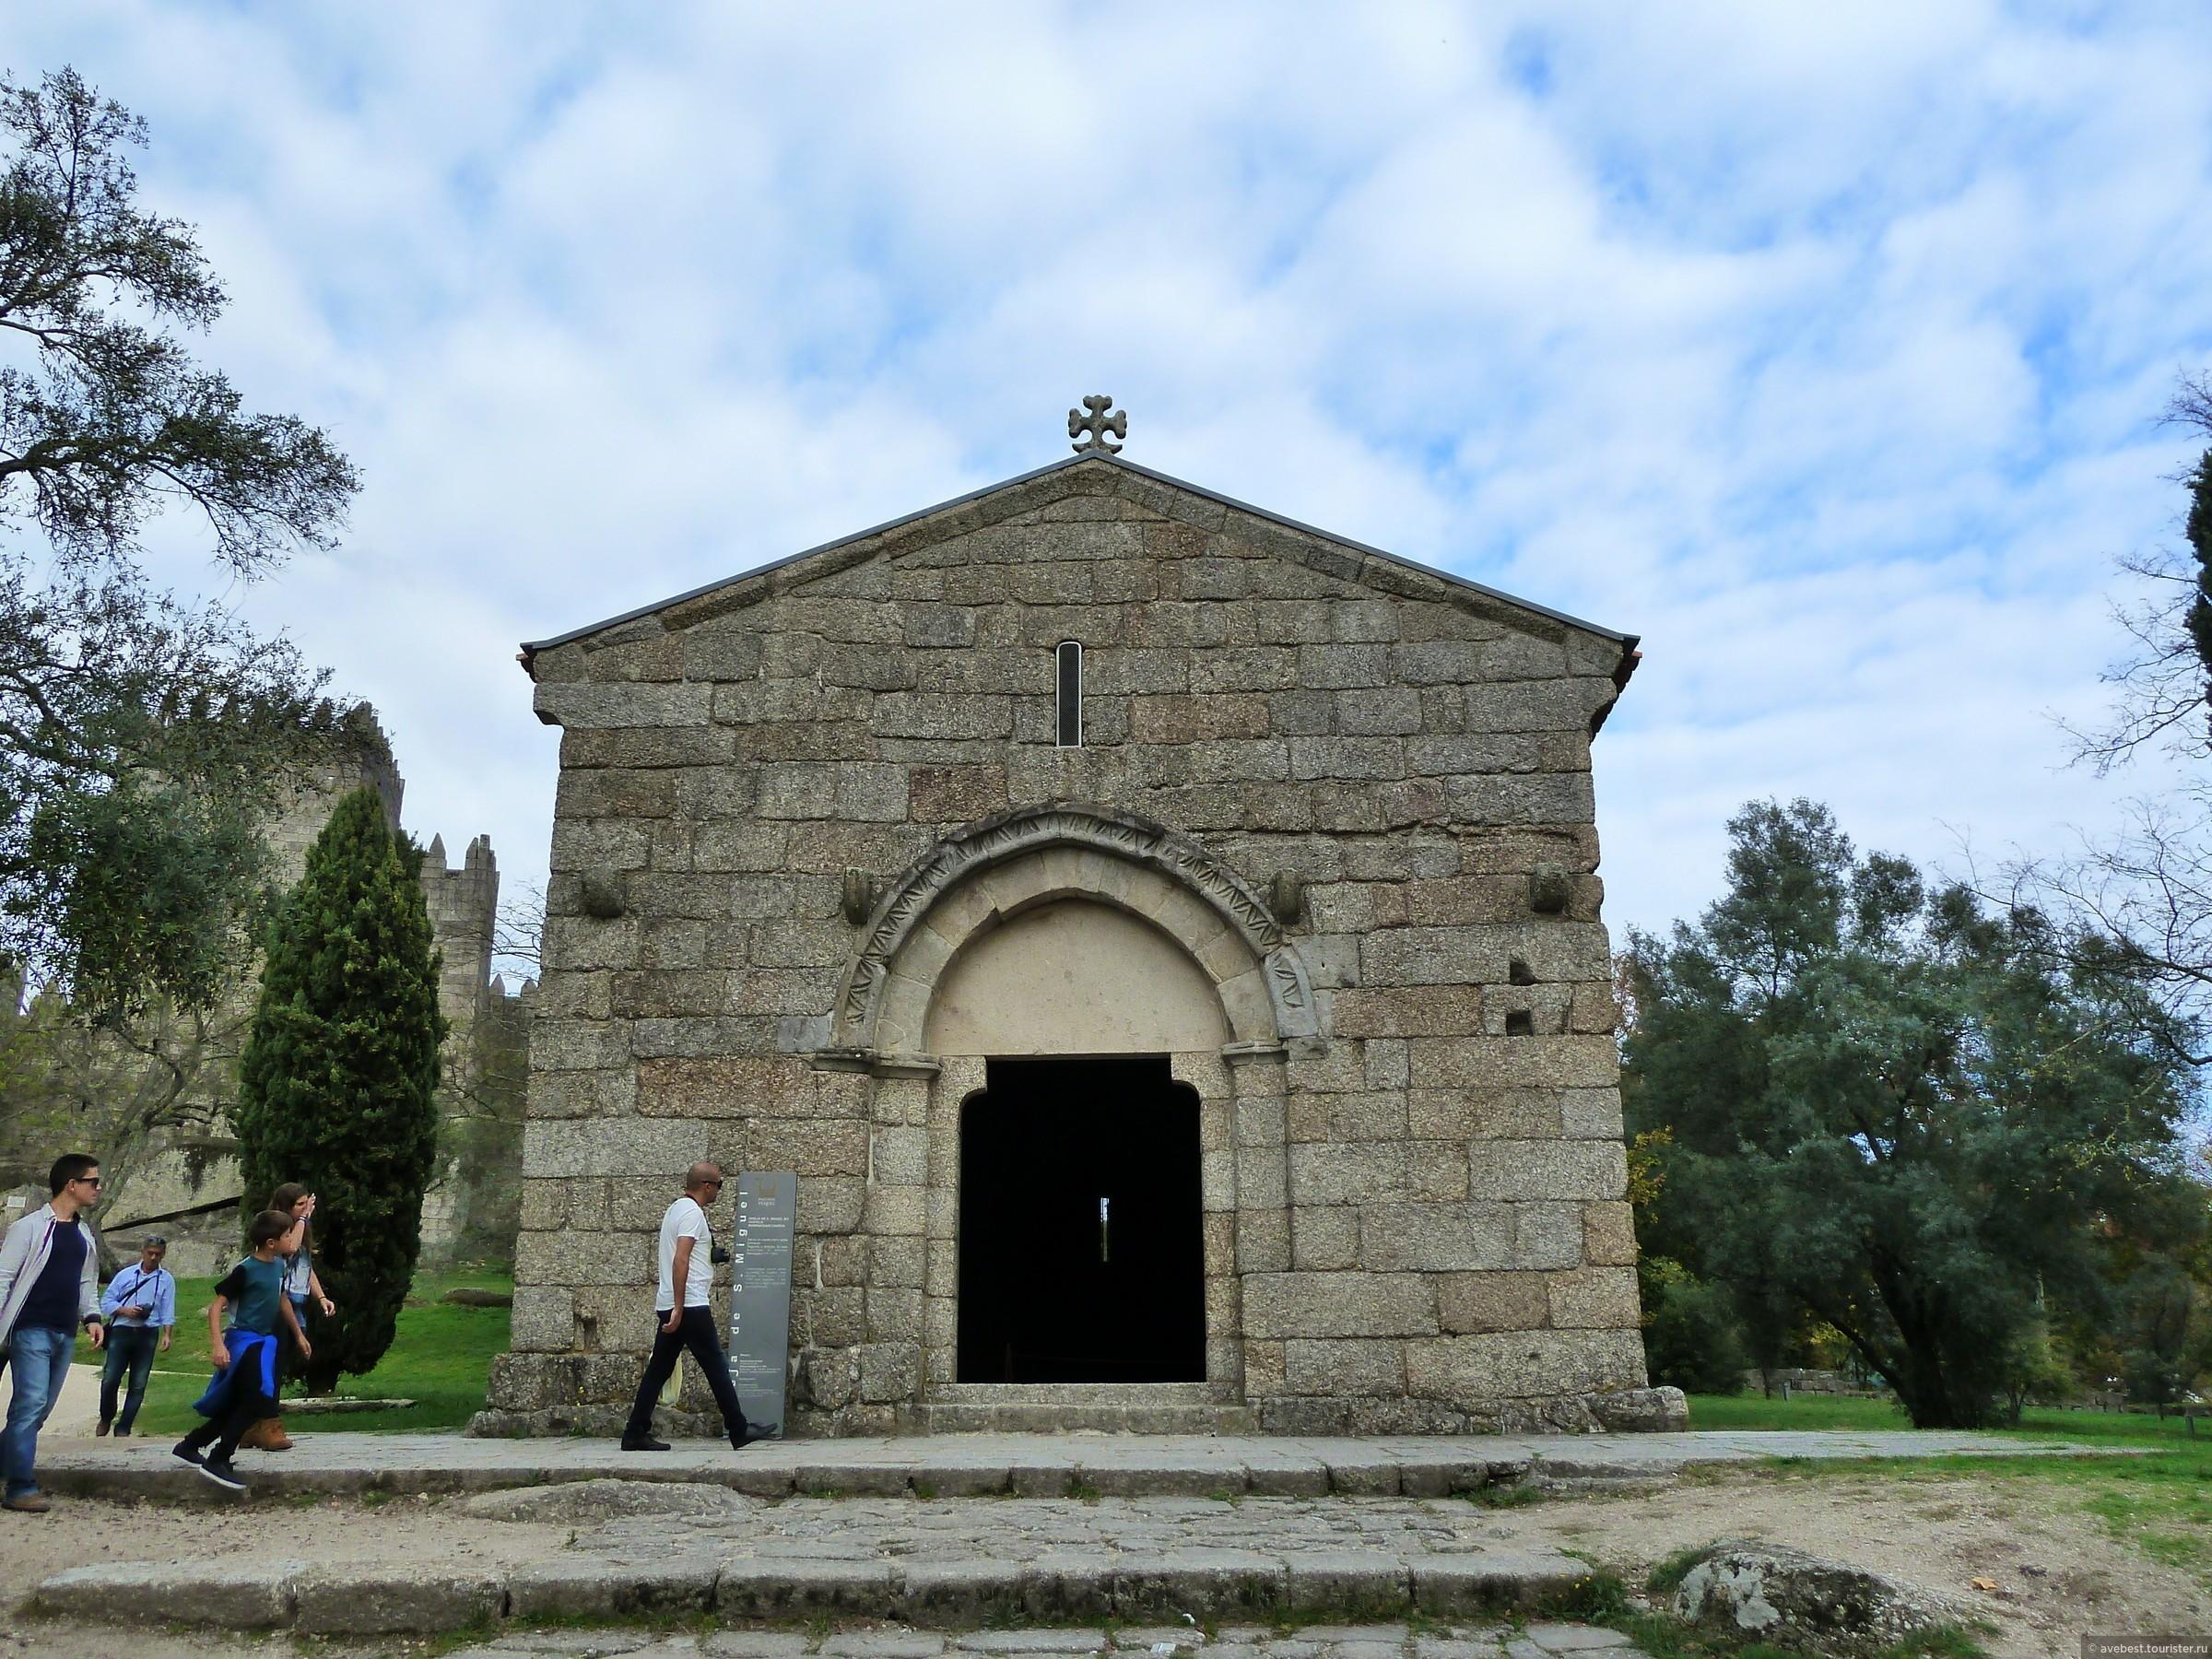 Капелла Сан-Мигель-ду-Каштелу